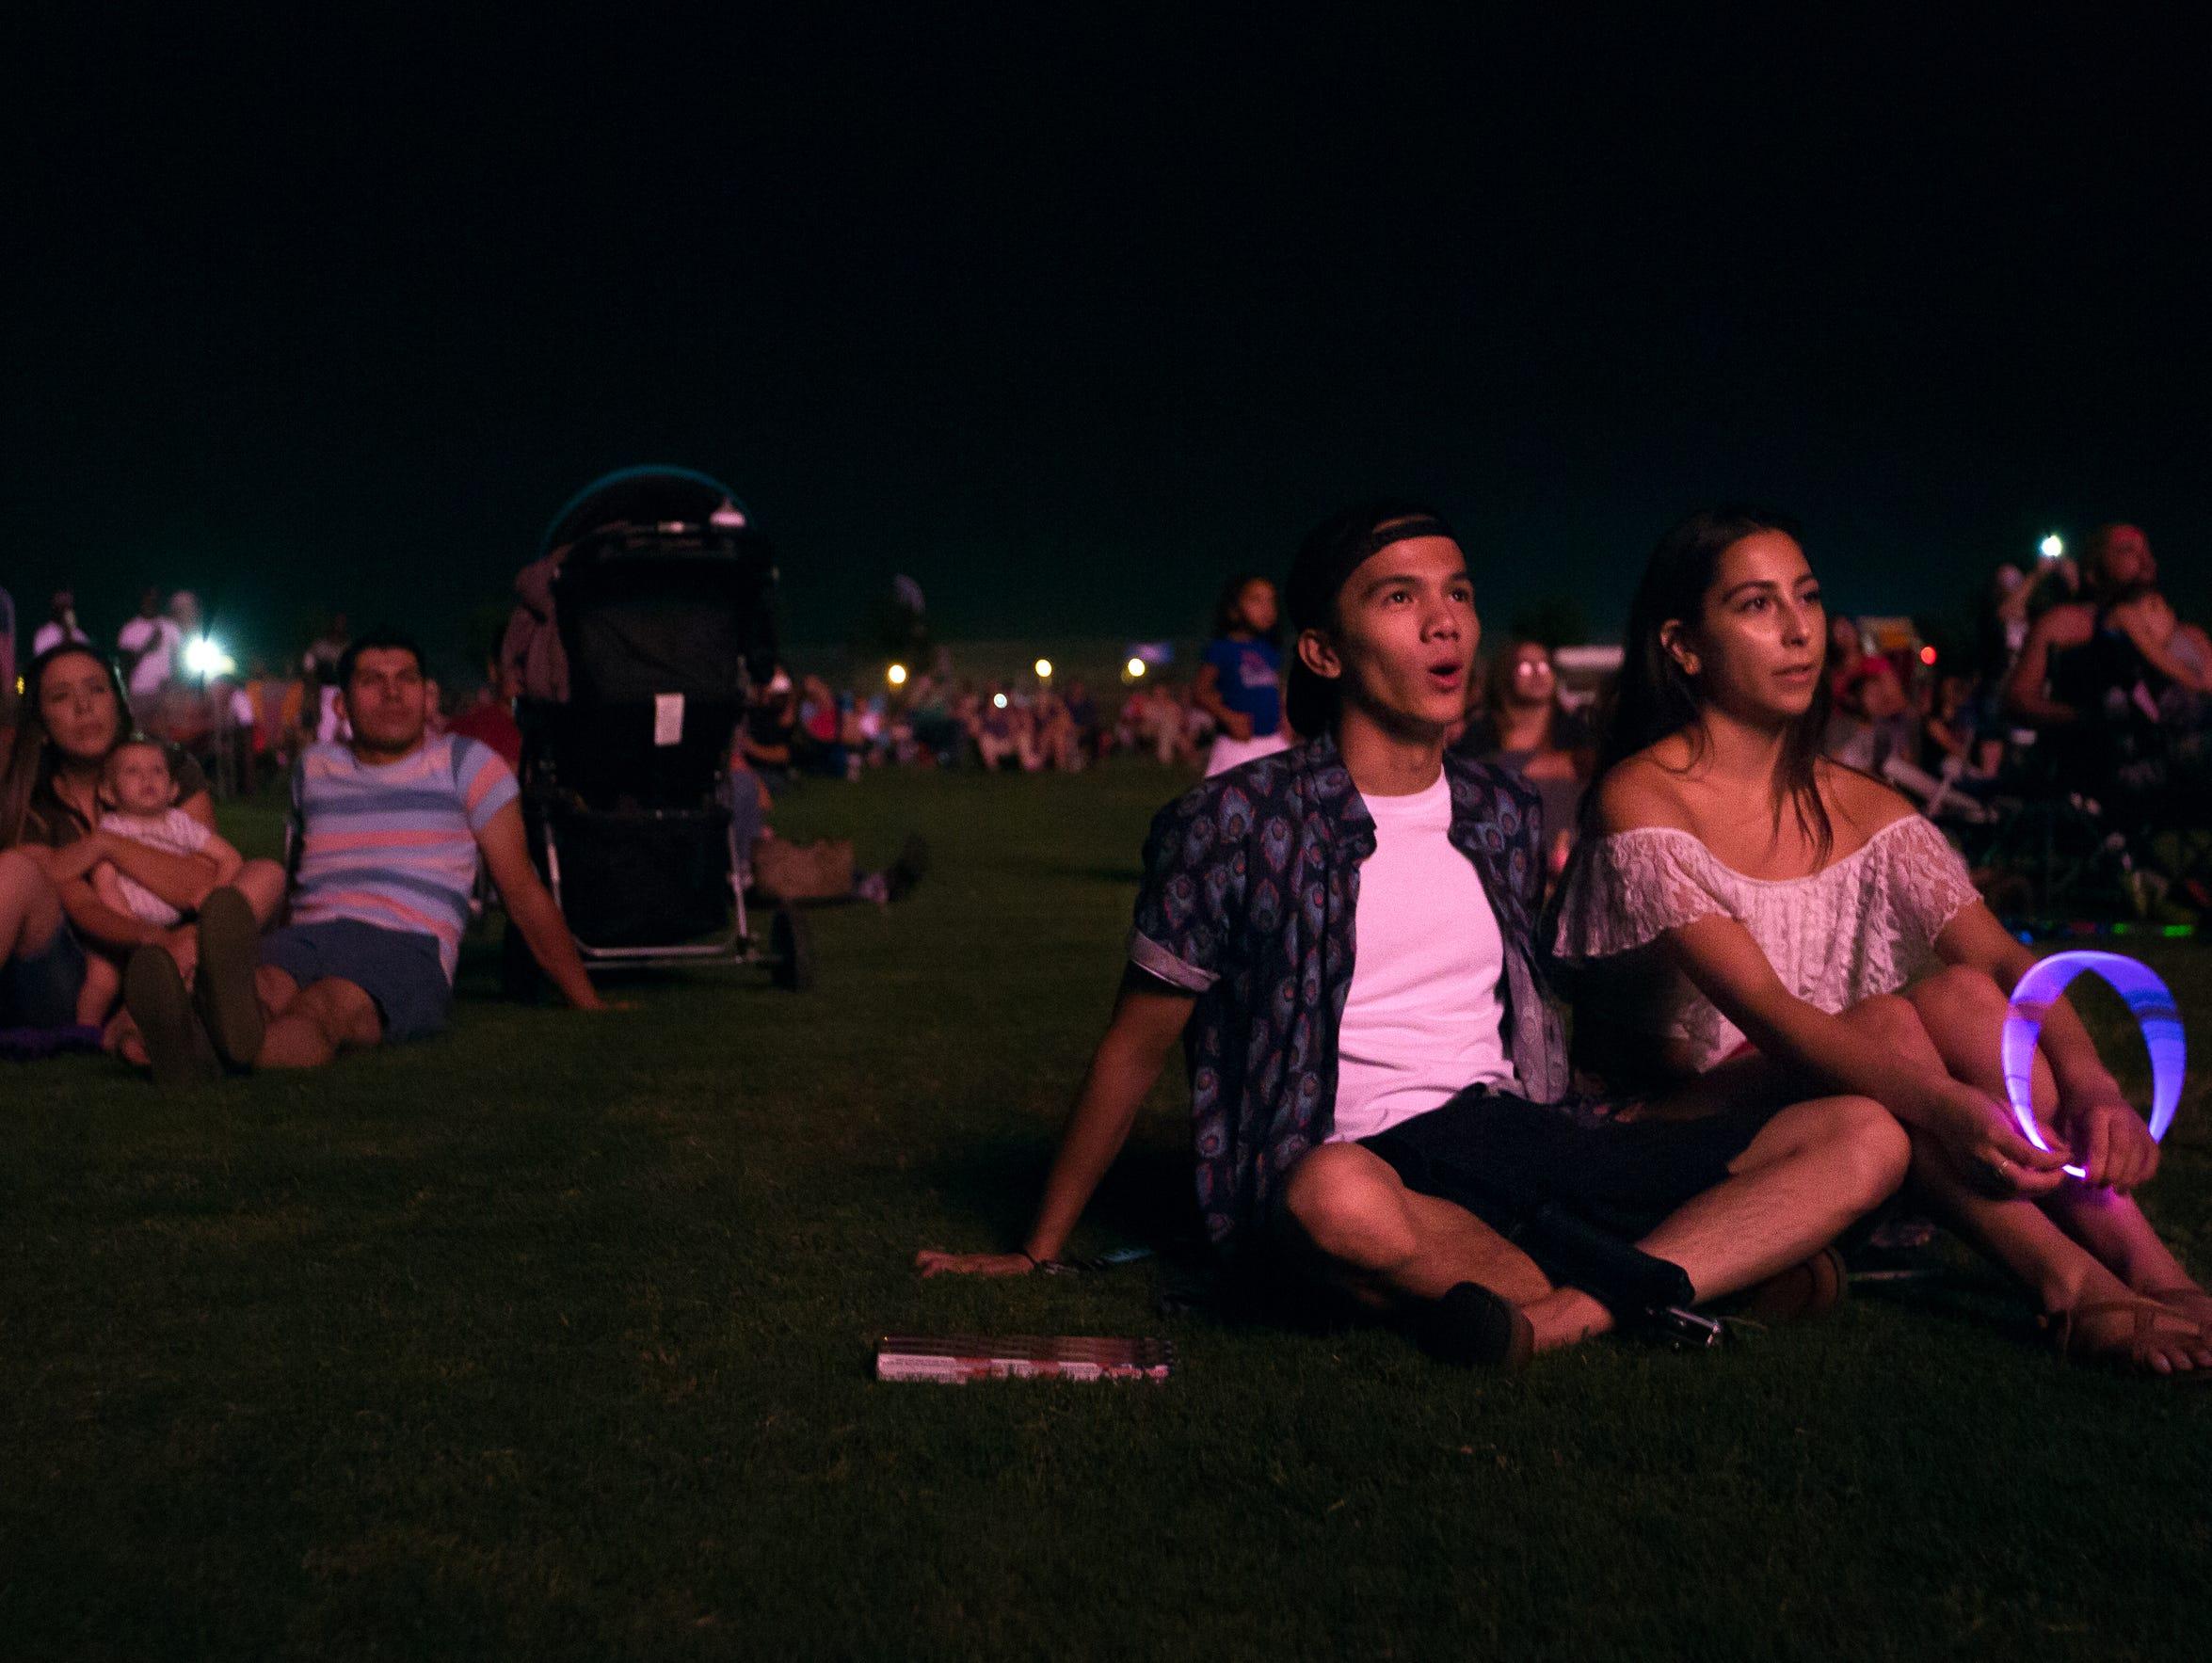 Ian Navarro, right, and Sabrina Flores watch fireworks